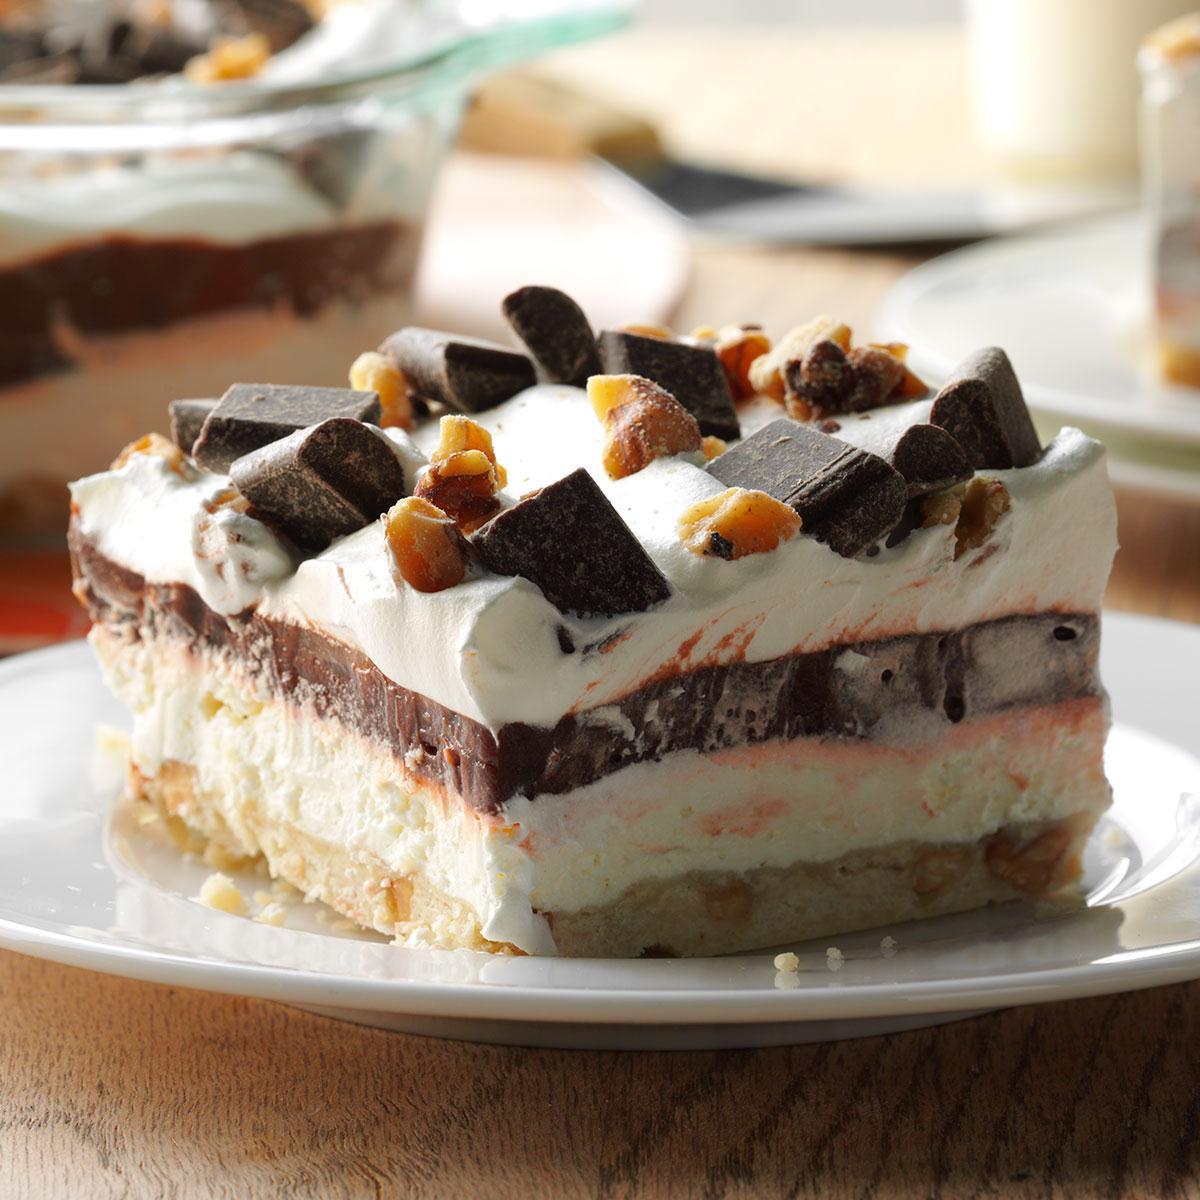 Layered Pudding Desserts  Easy Four Layer Chocolate Dessert Recipe